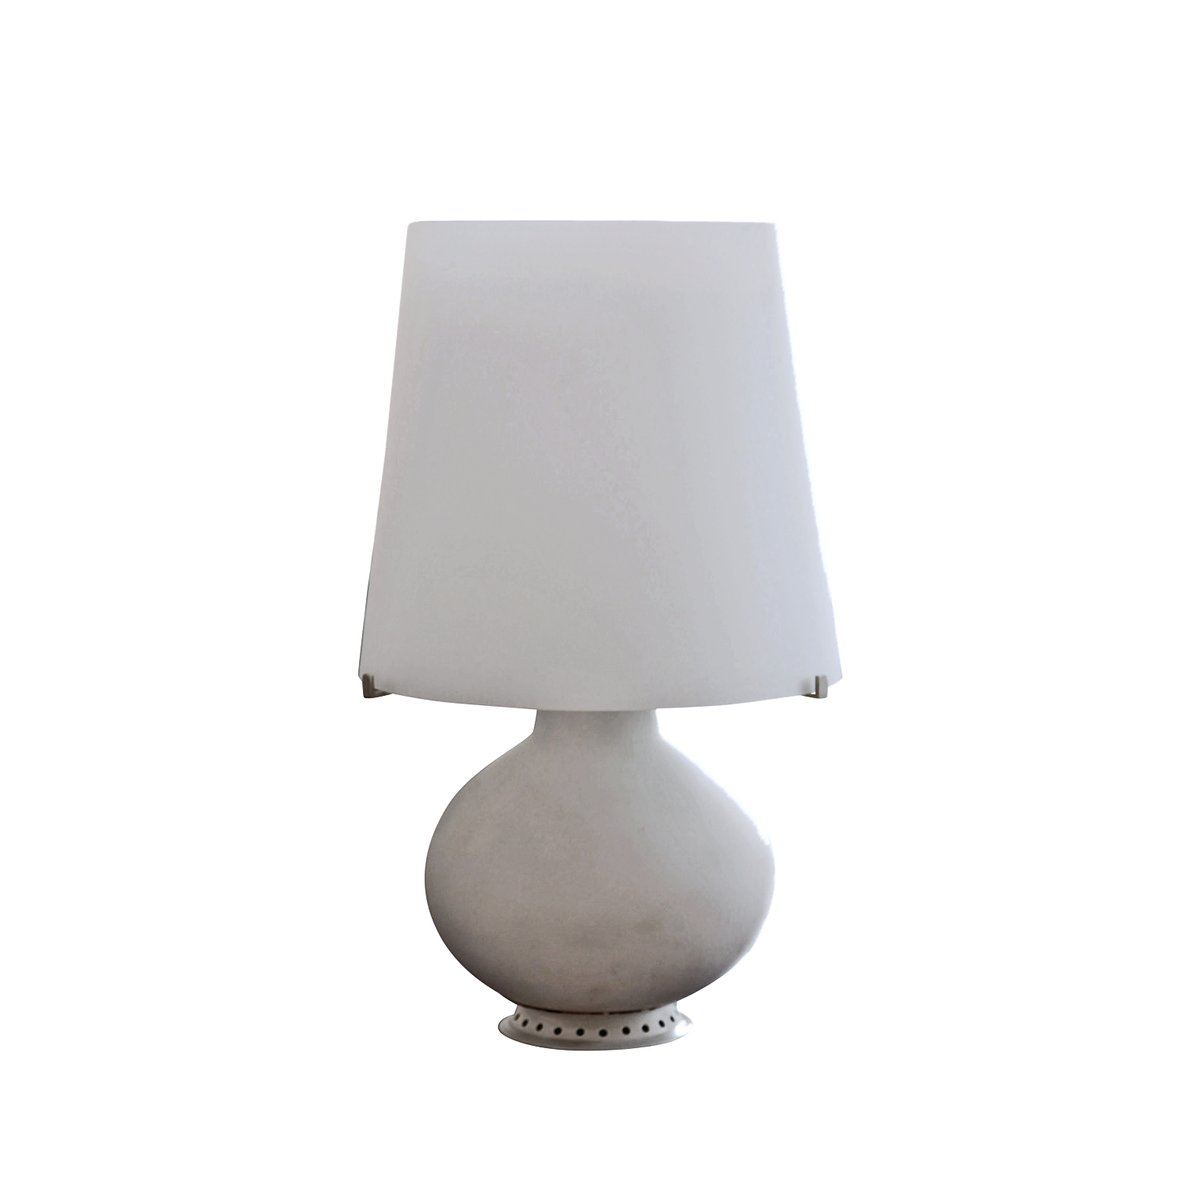 Fontana 1853 Table Lamp by Max Ingrand for Fontana Arte for sale ...